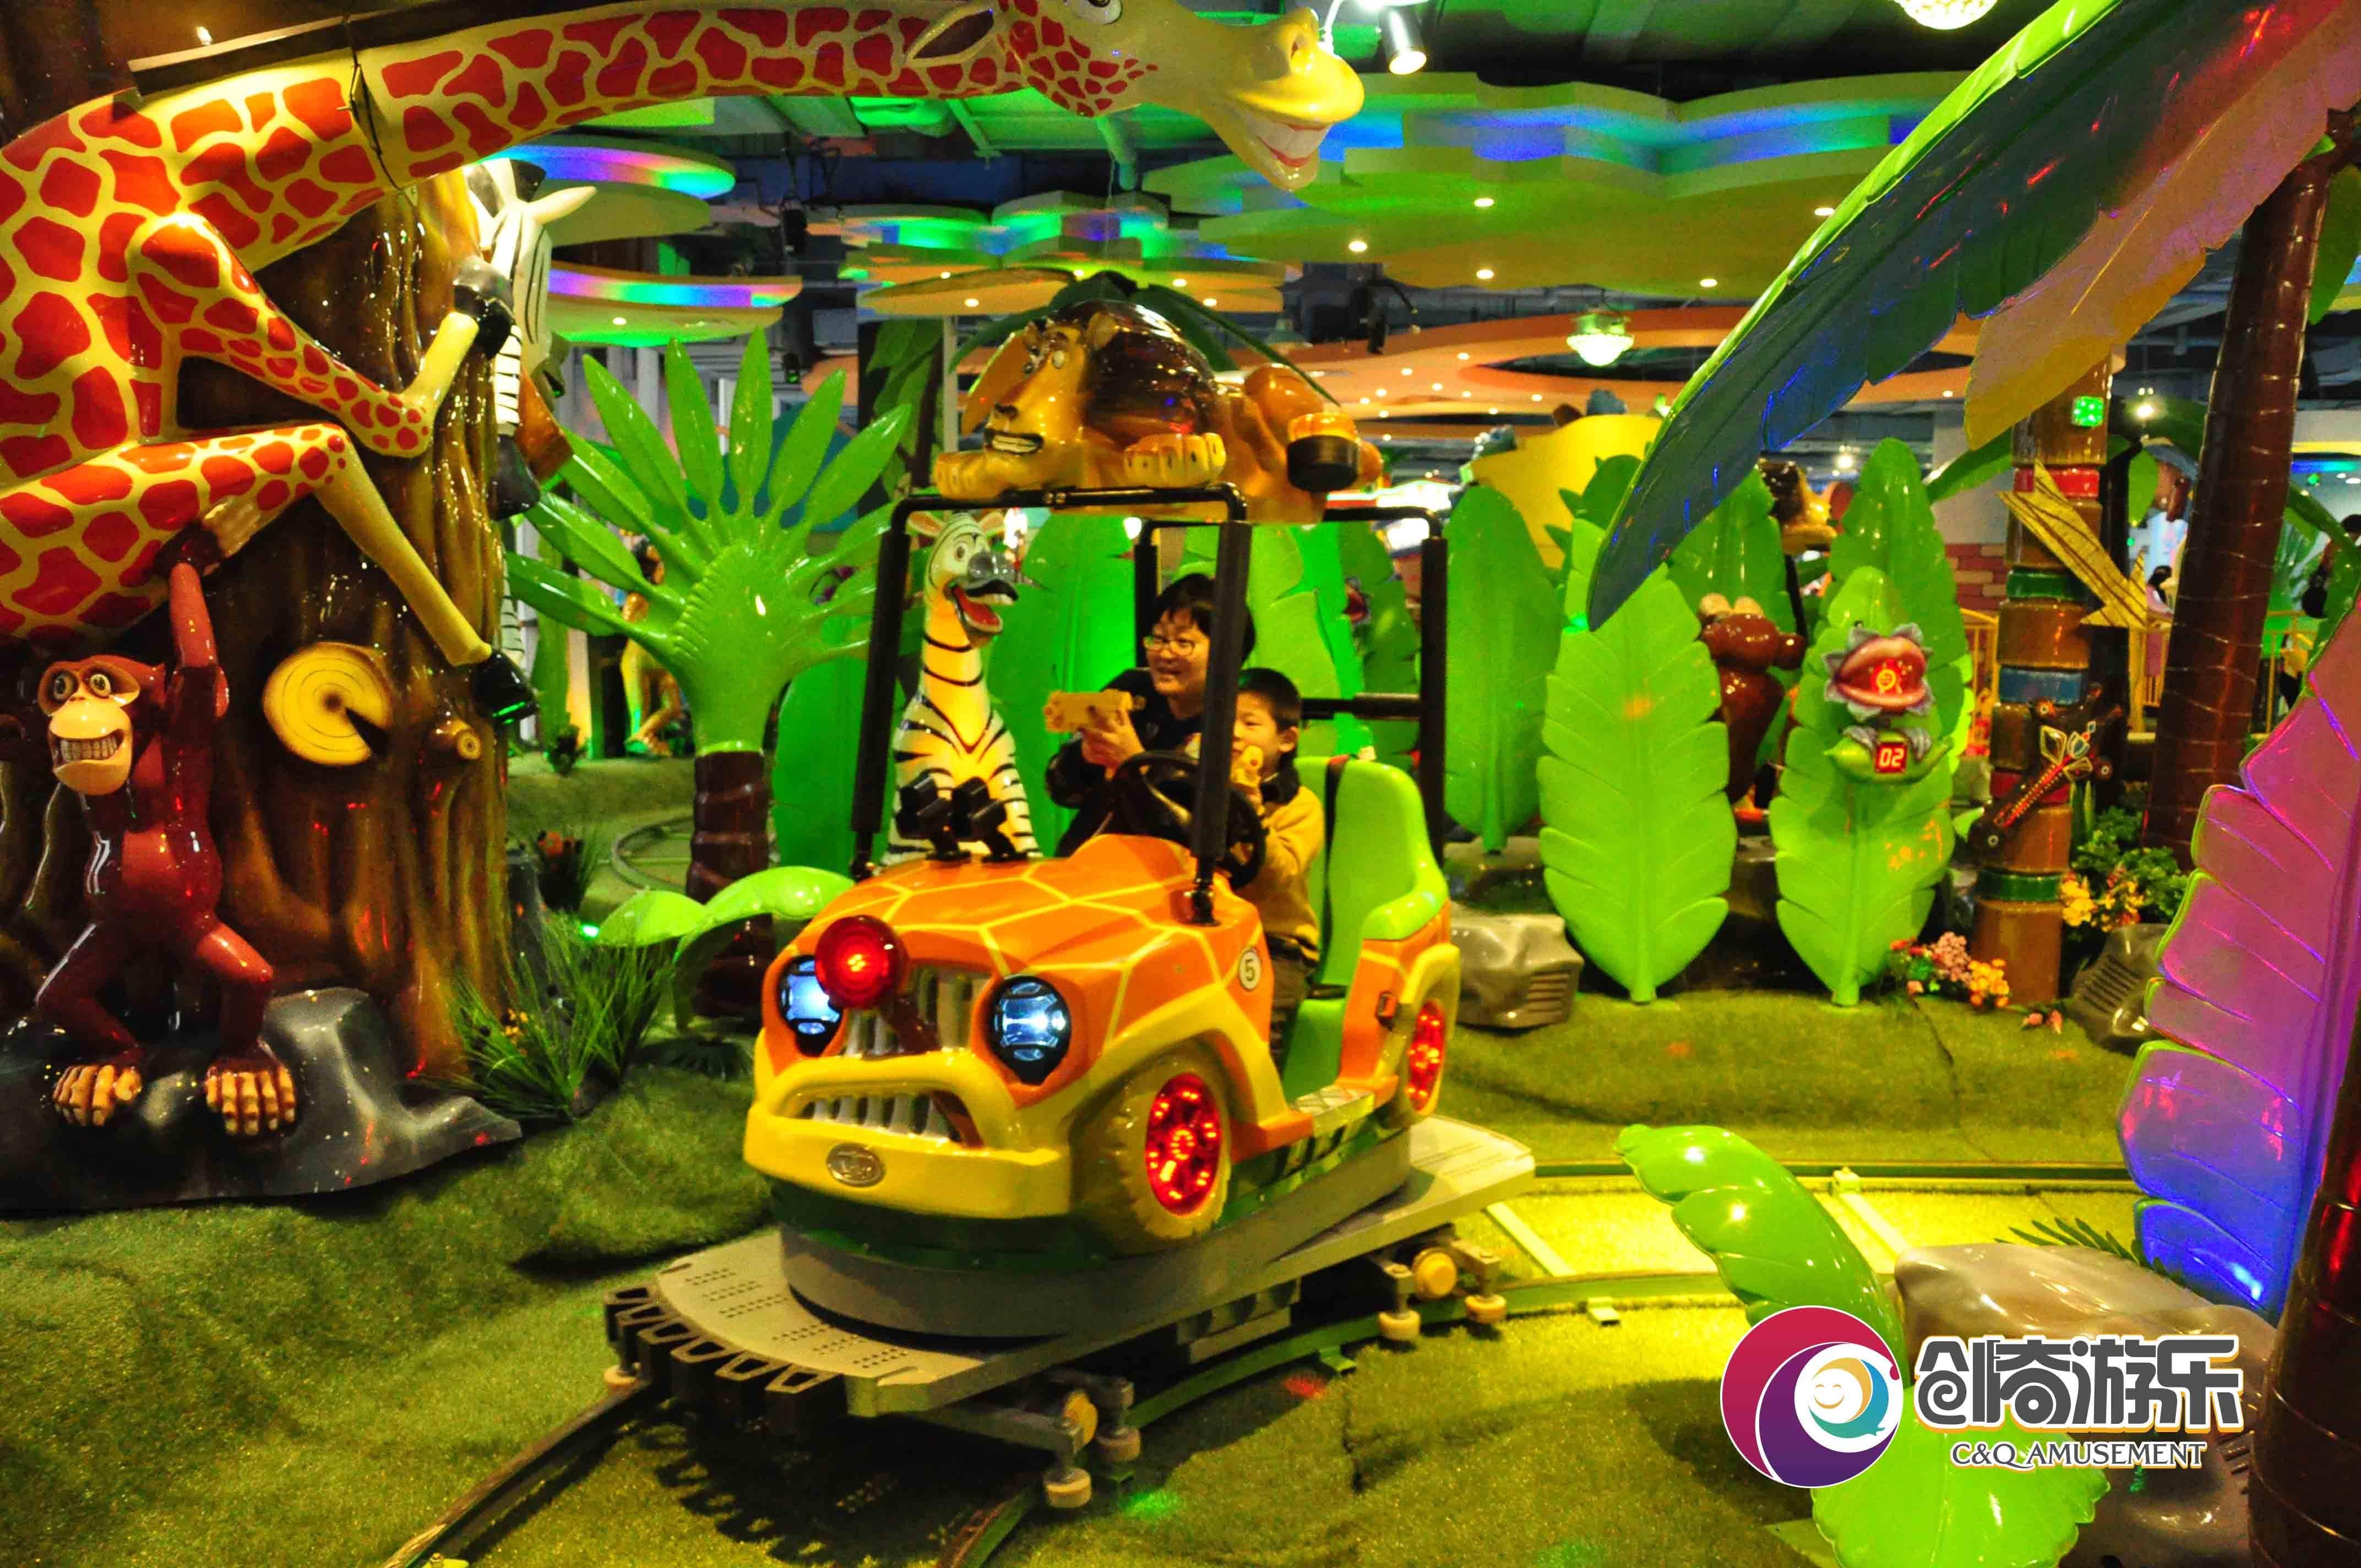 Jungle Safari for amusement park, shooting car, track rides